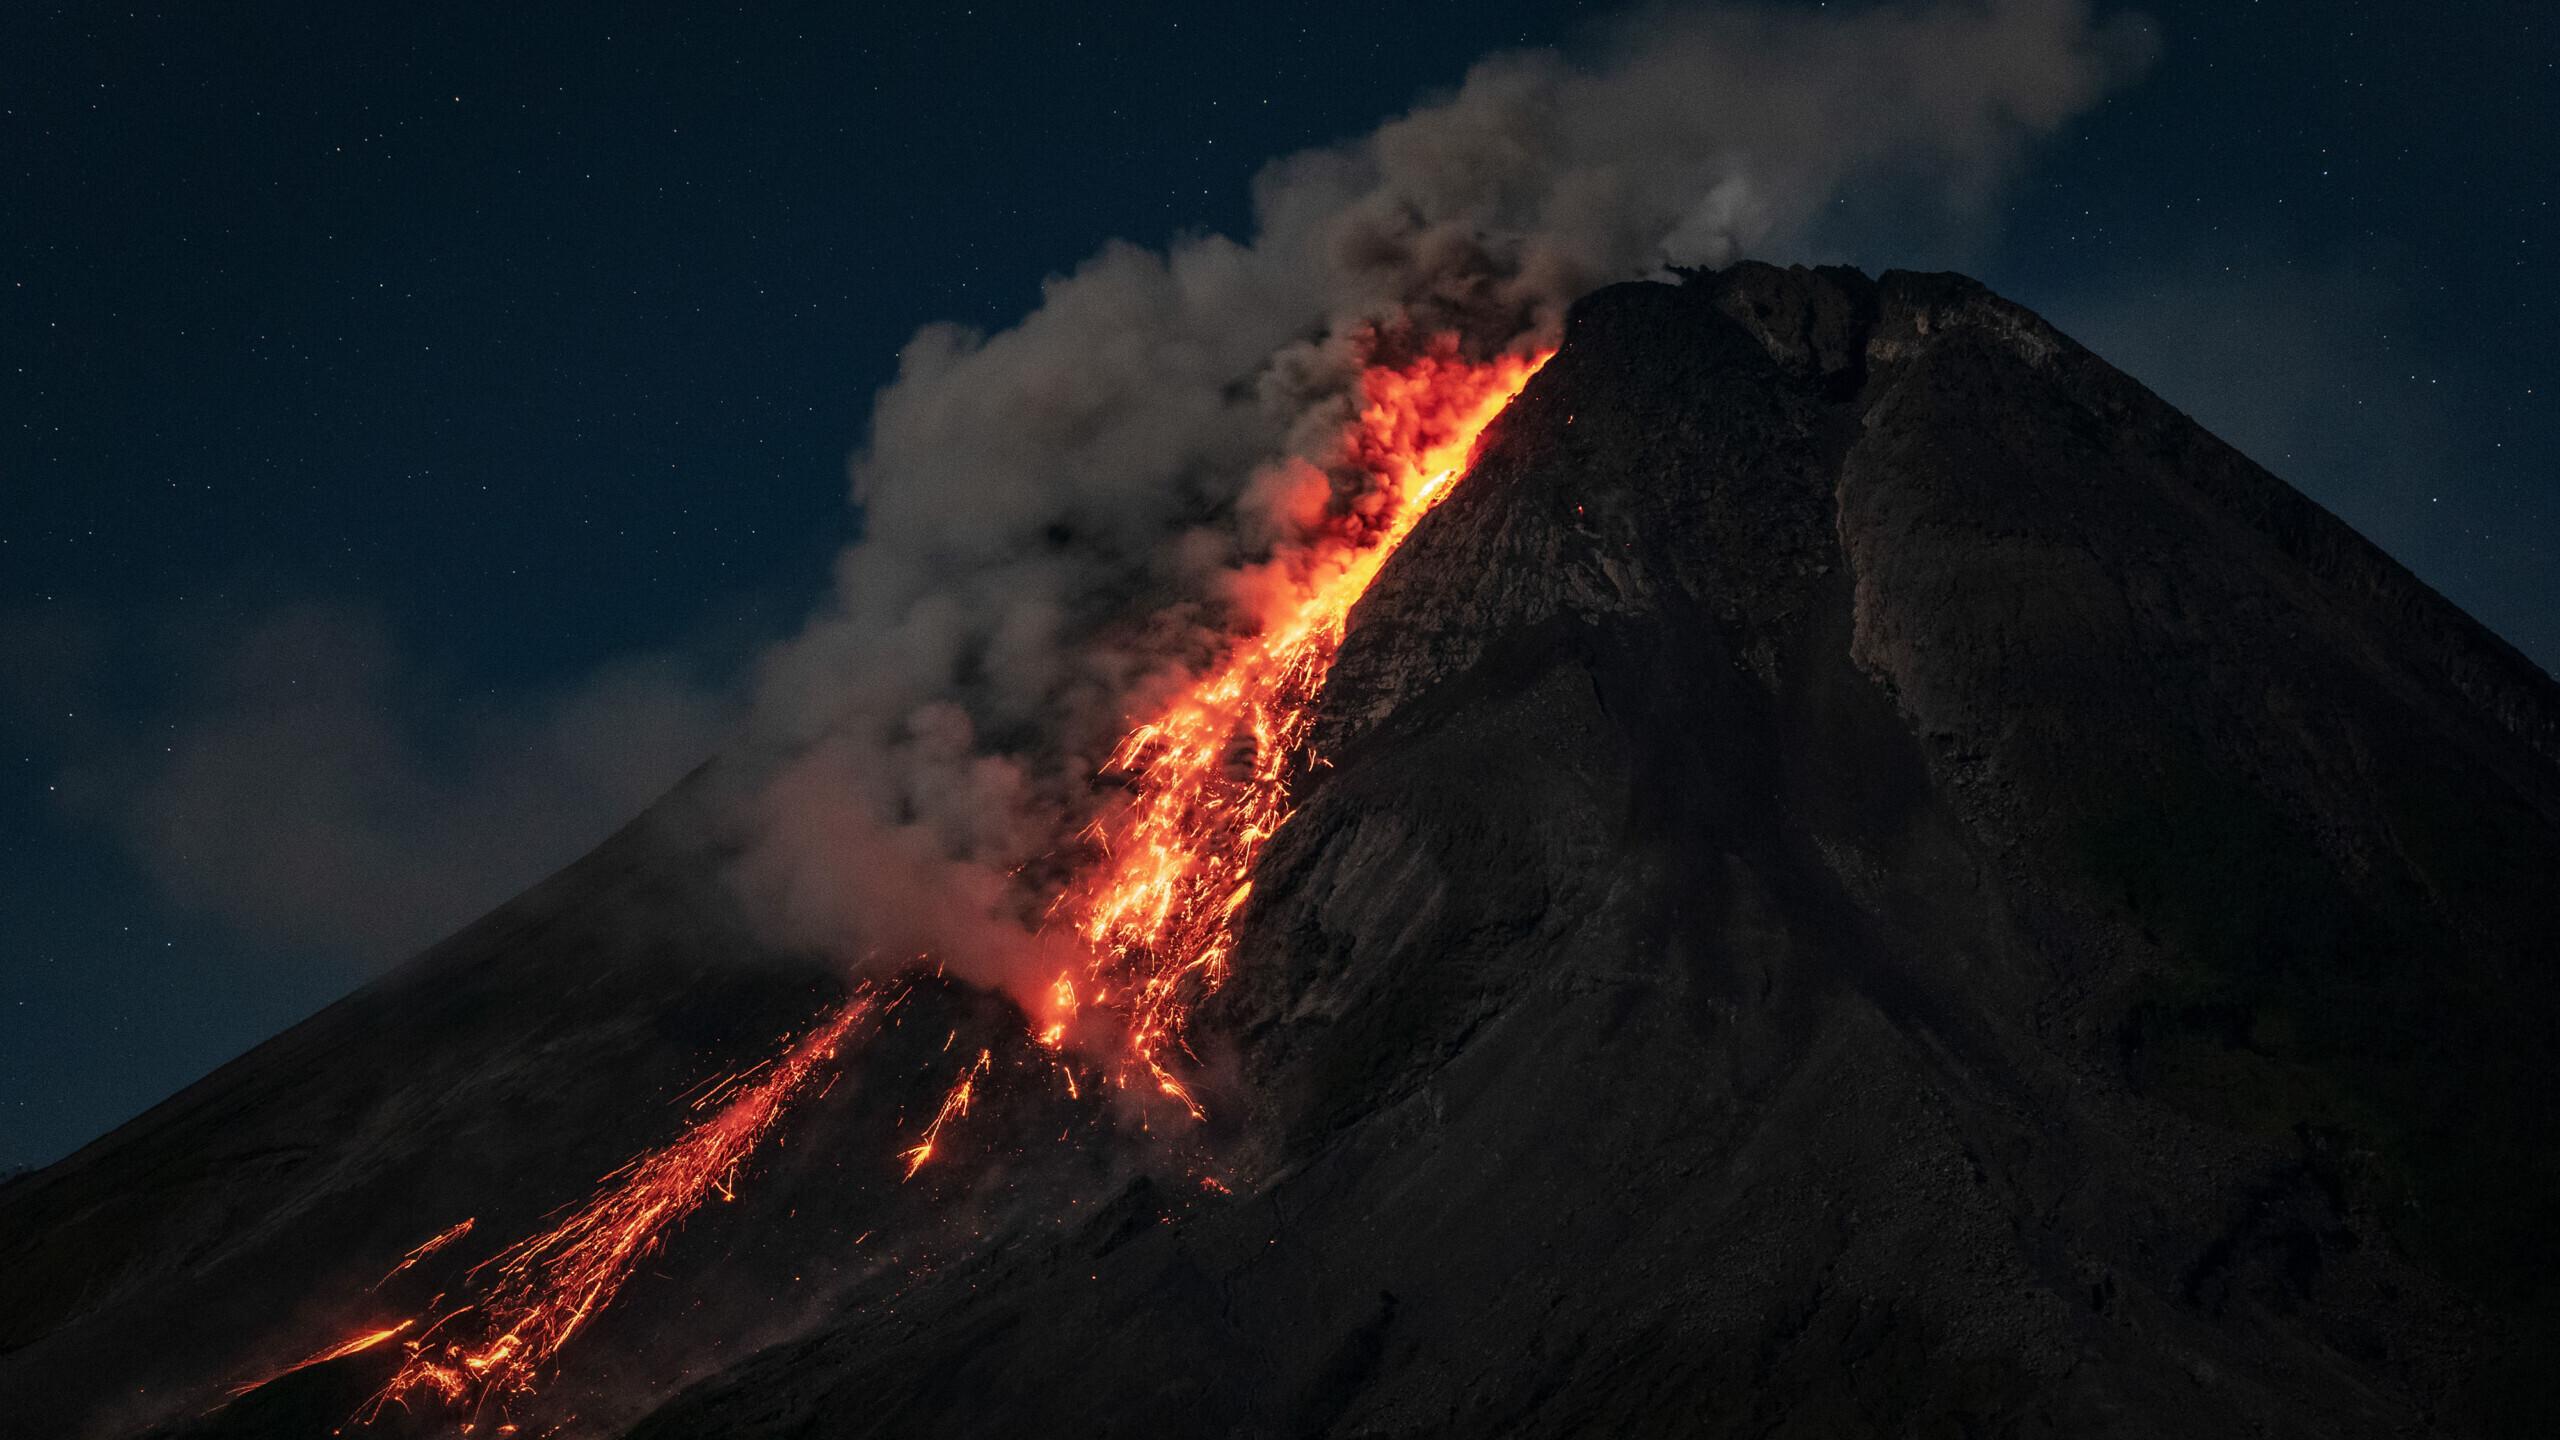 Smarter News Quiz: Spaceships, Prayers and Volcanoes